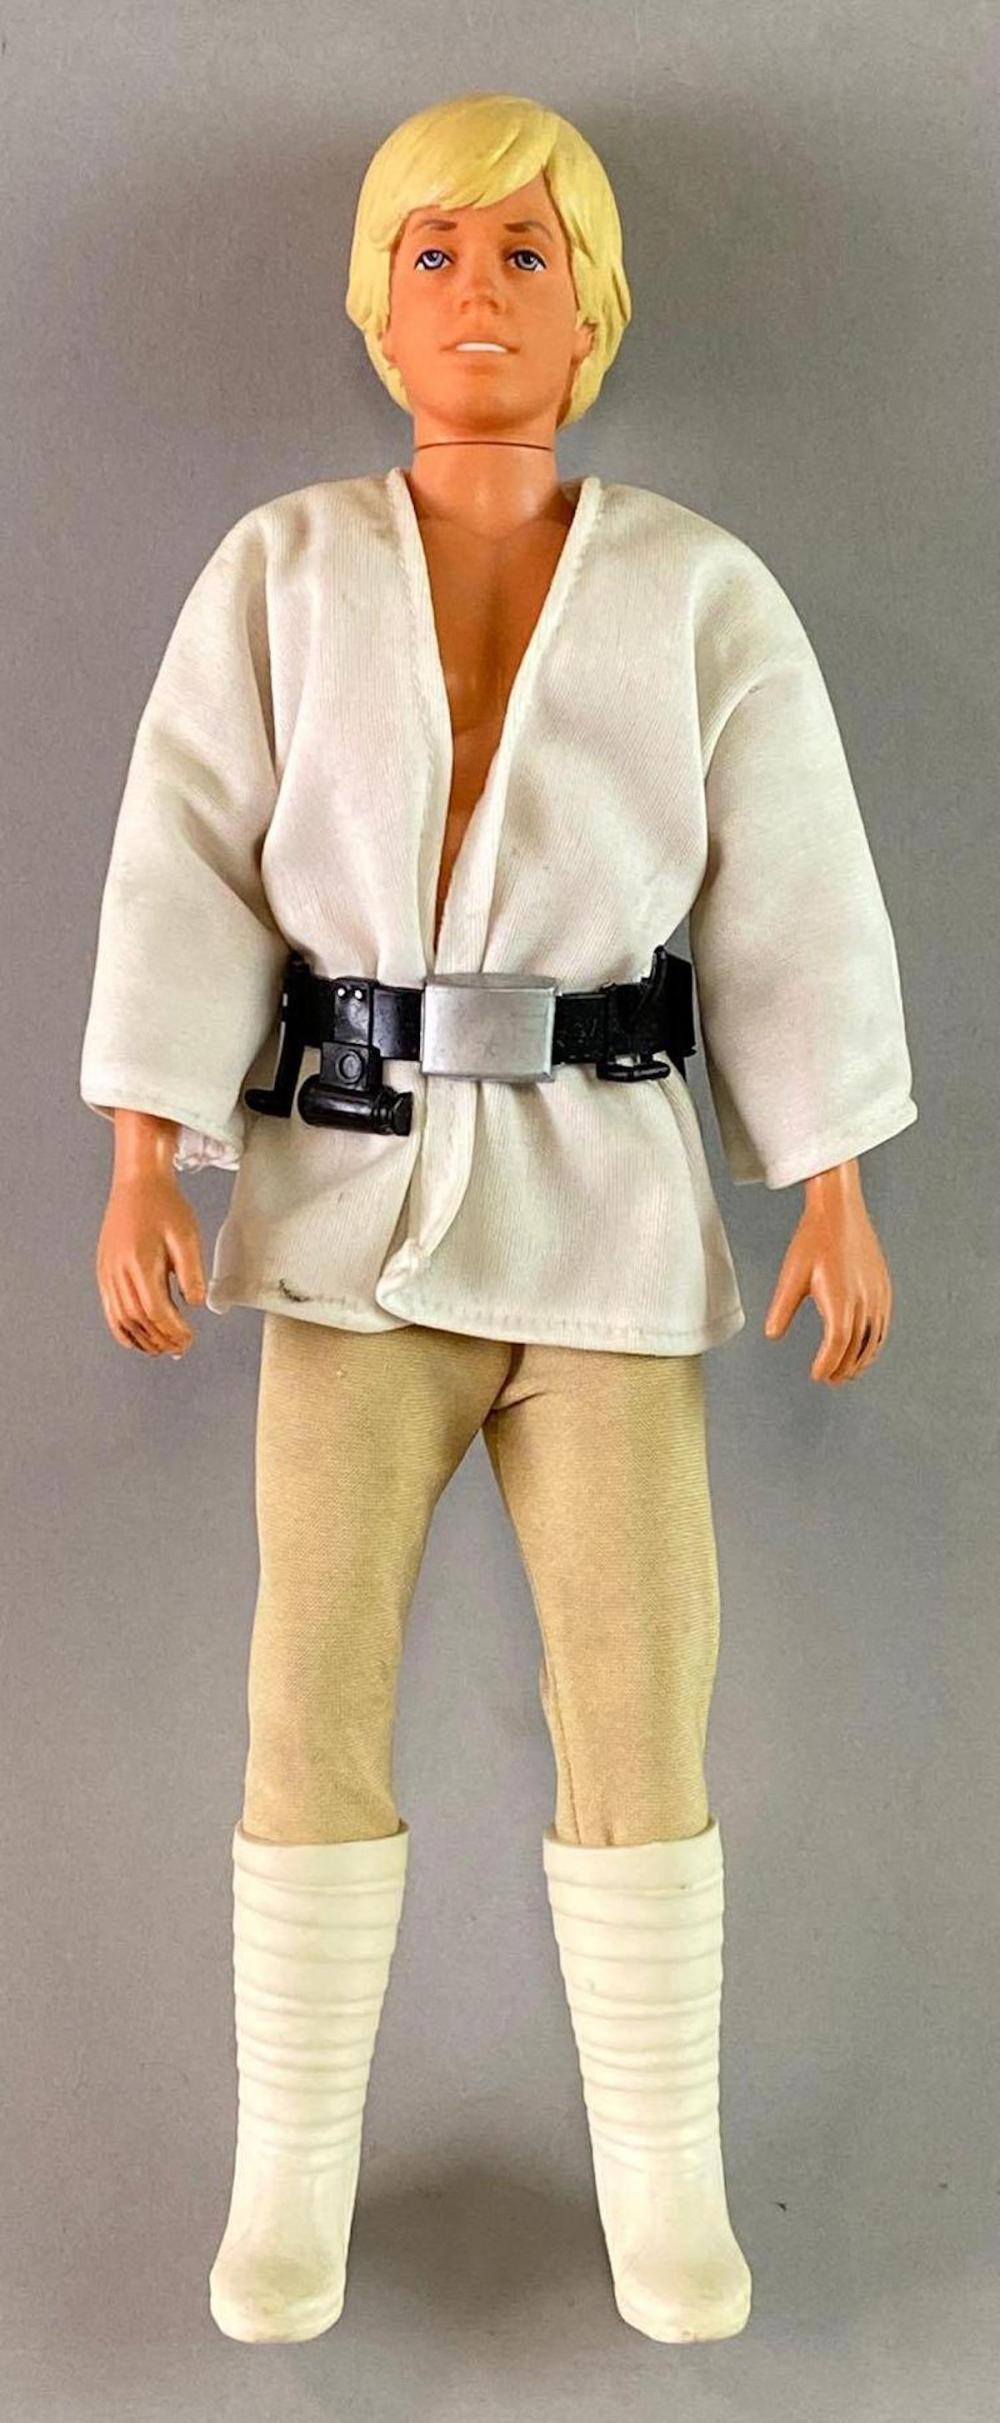 Kenner Star Wars Luke Skywalker Action Figure